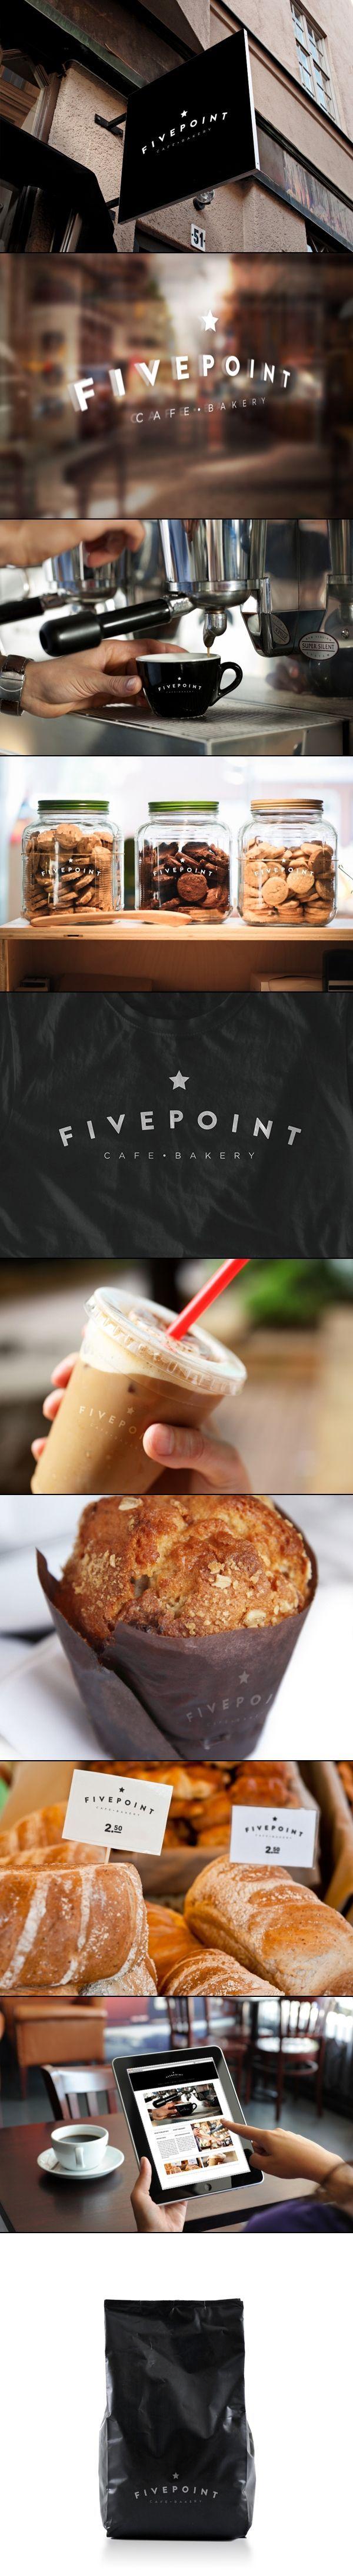 Fivepoint Cafe & Bakery | Matt Ivory. let's take a snack break #identity #packaging #branding PD